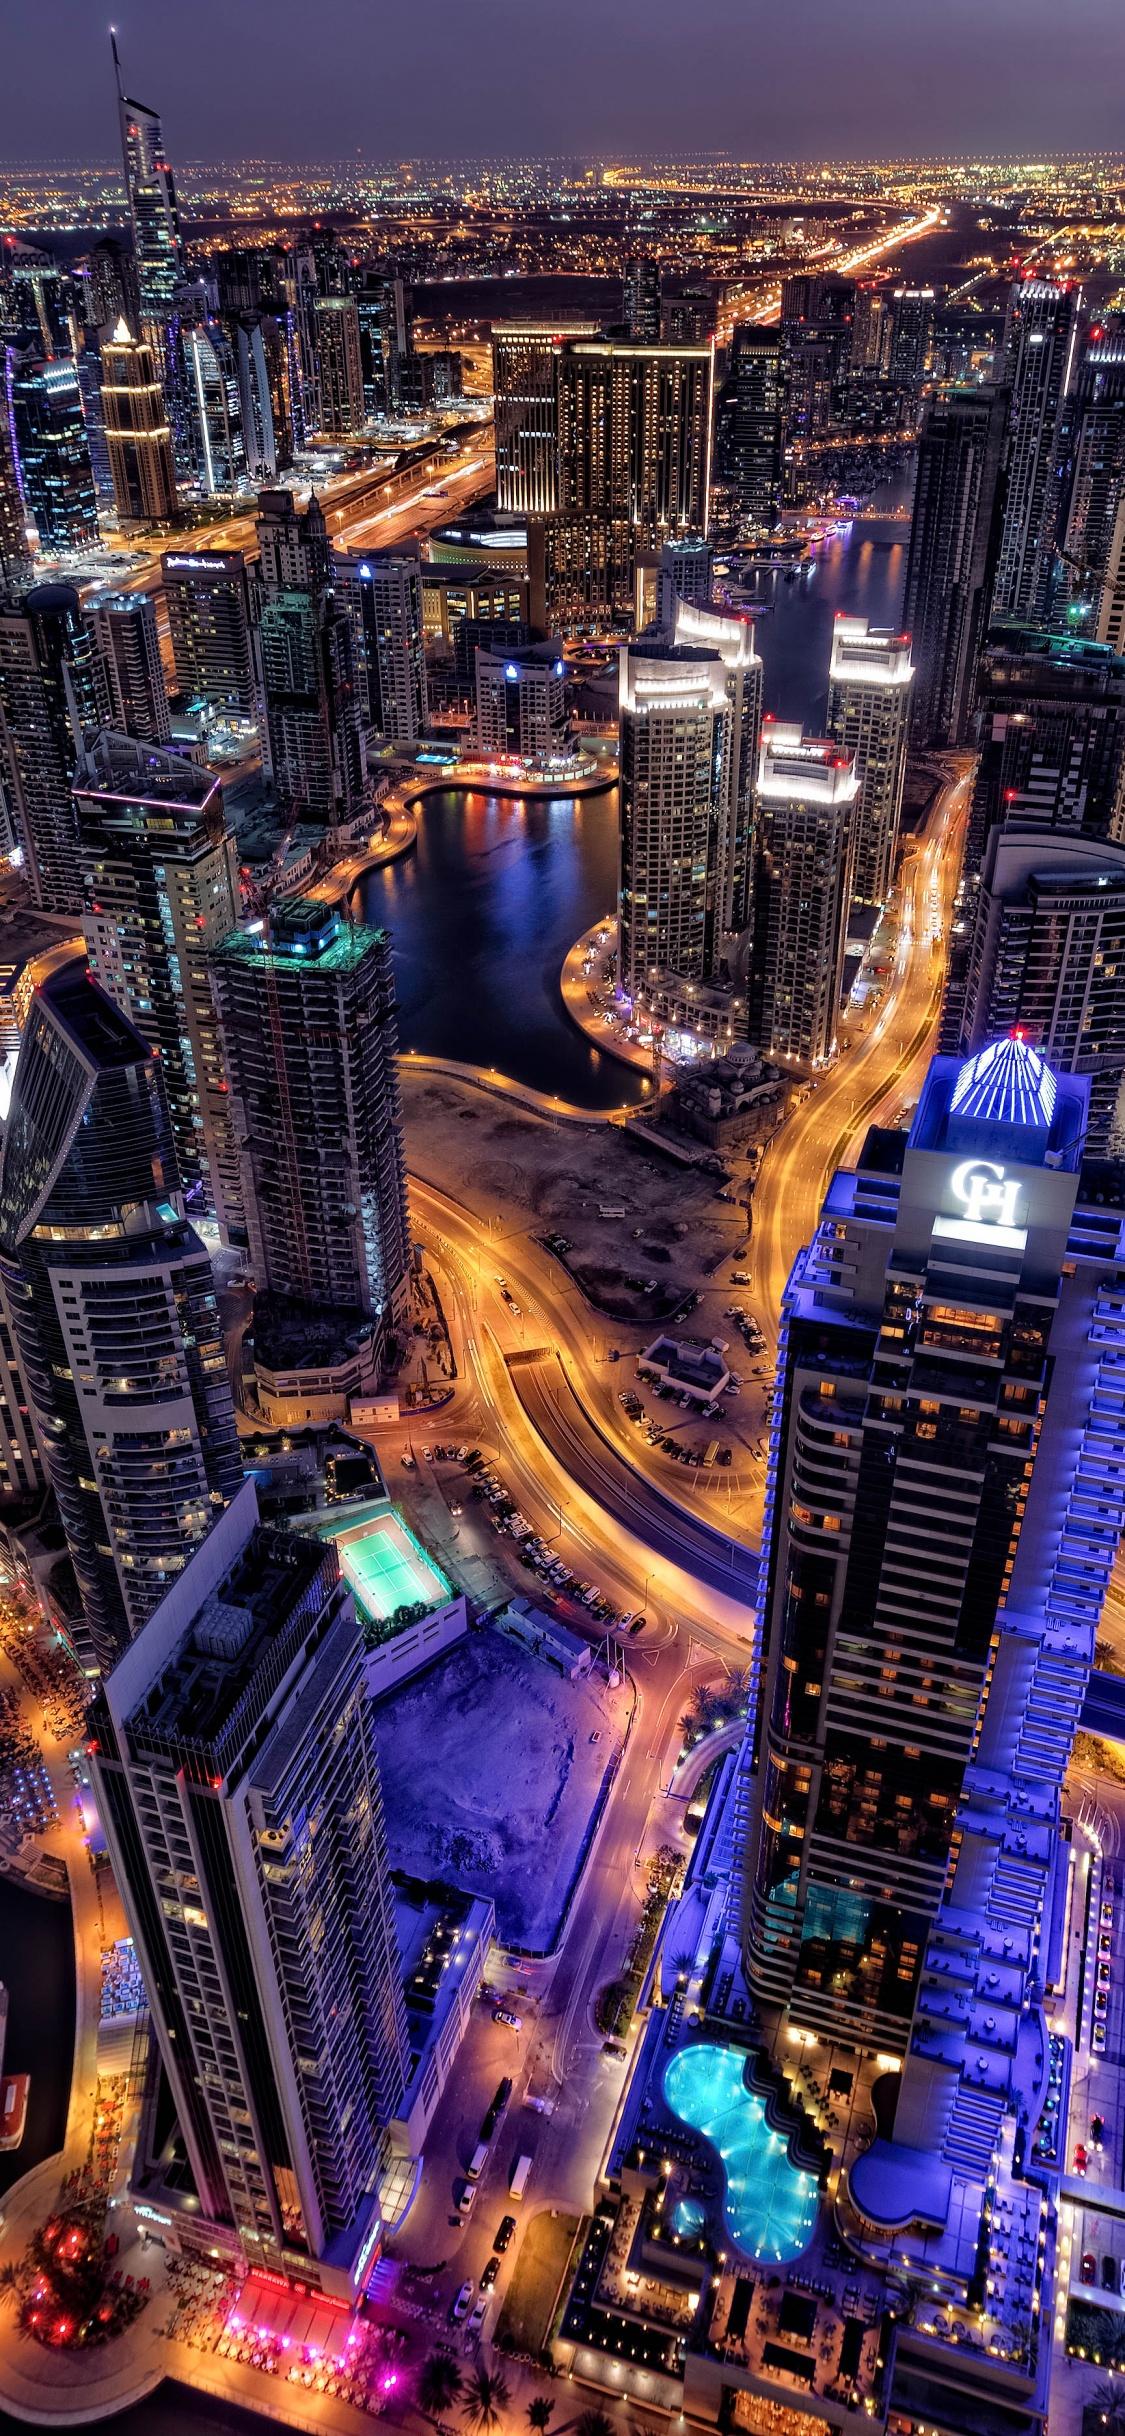 Dubai 4k Wallpaper Cityscape Skyline Aerial View Skyscrapers City Lights Night Hdr World 1311